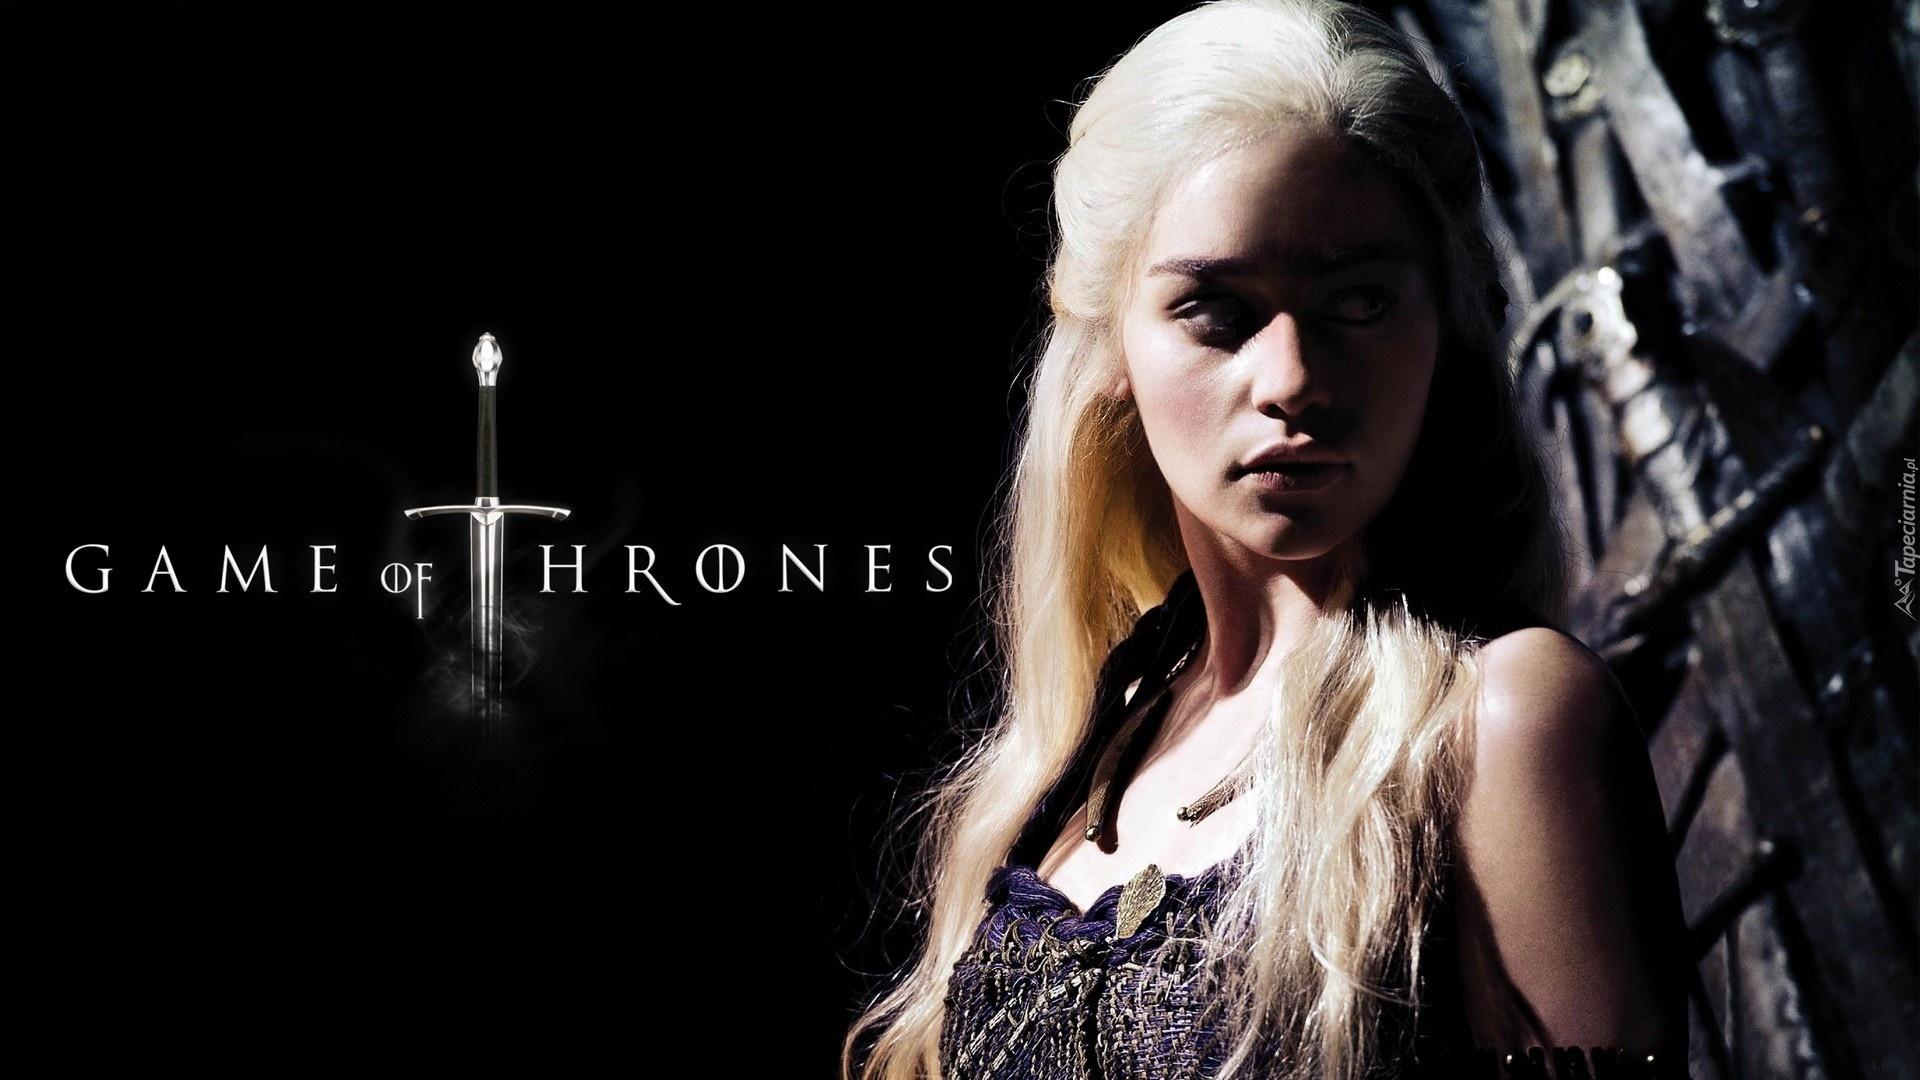 gra o tron, game of thrones, emilia clarke - daenerys targaryen